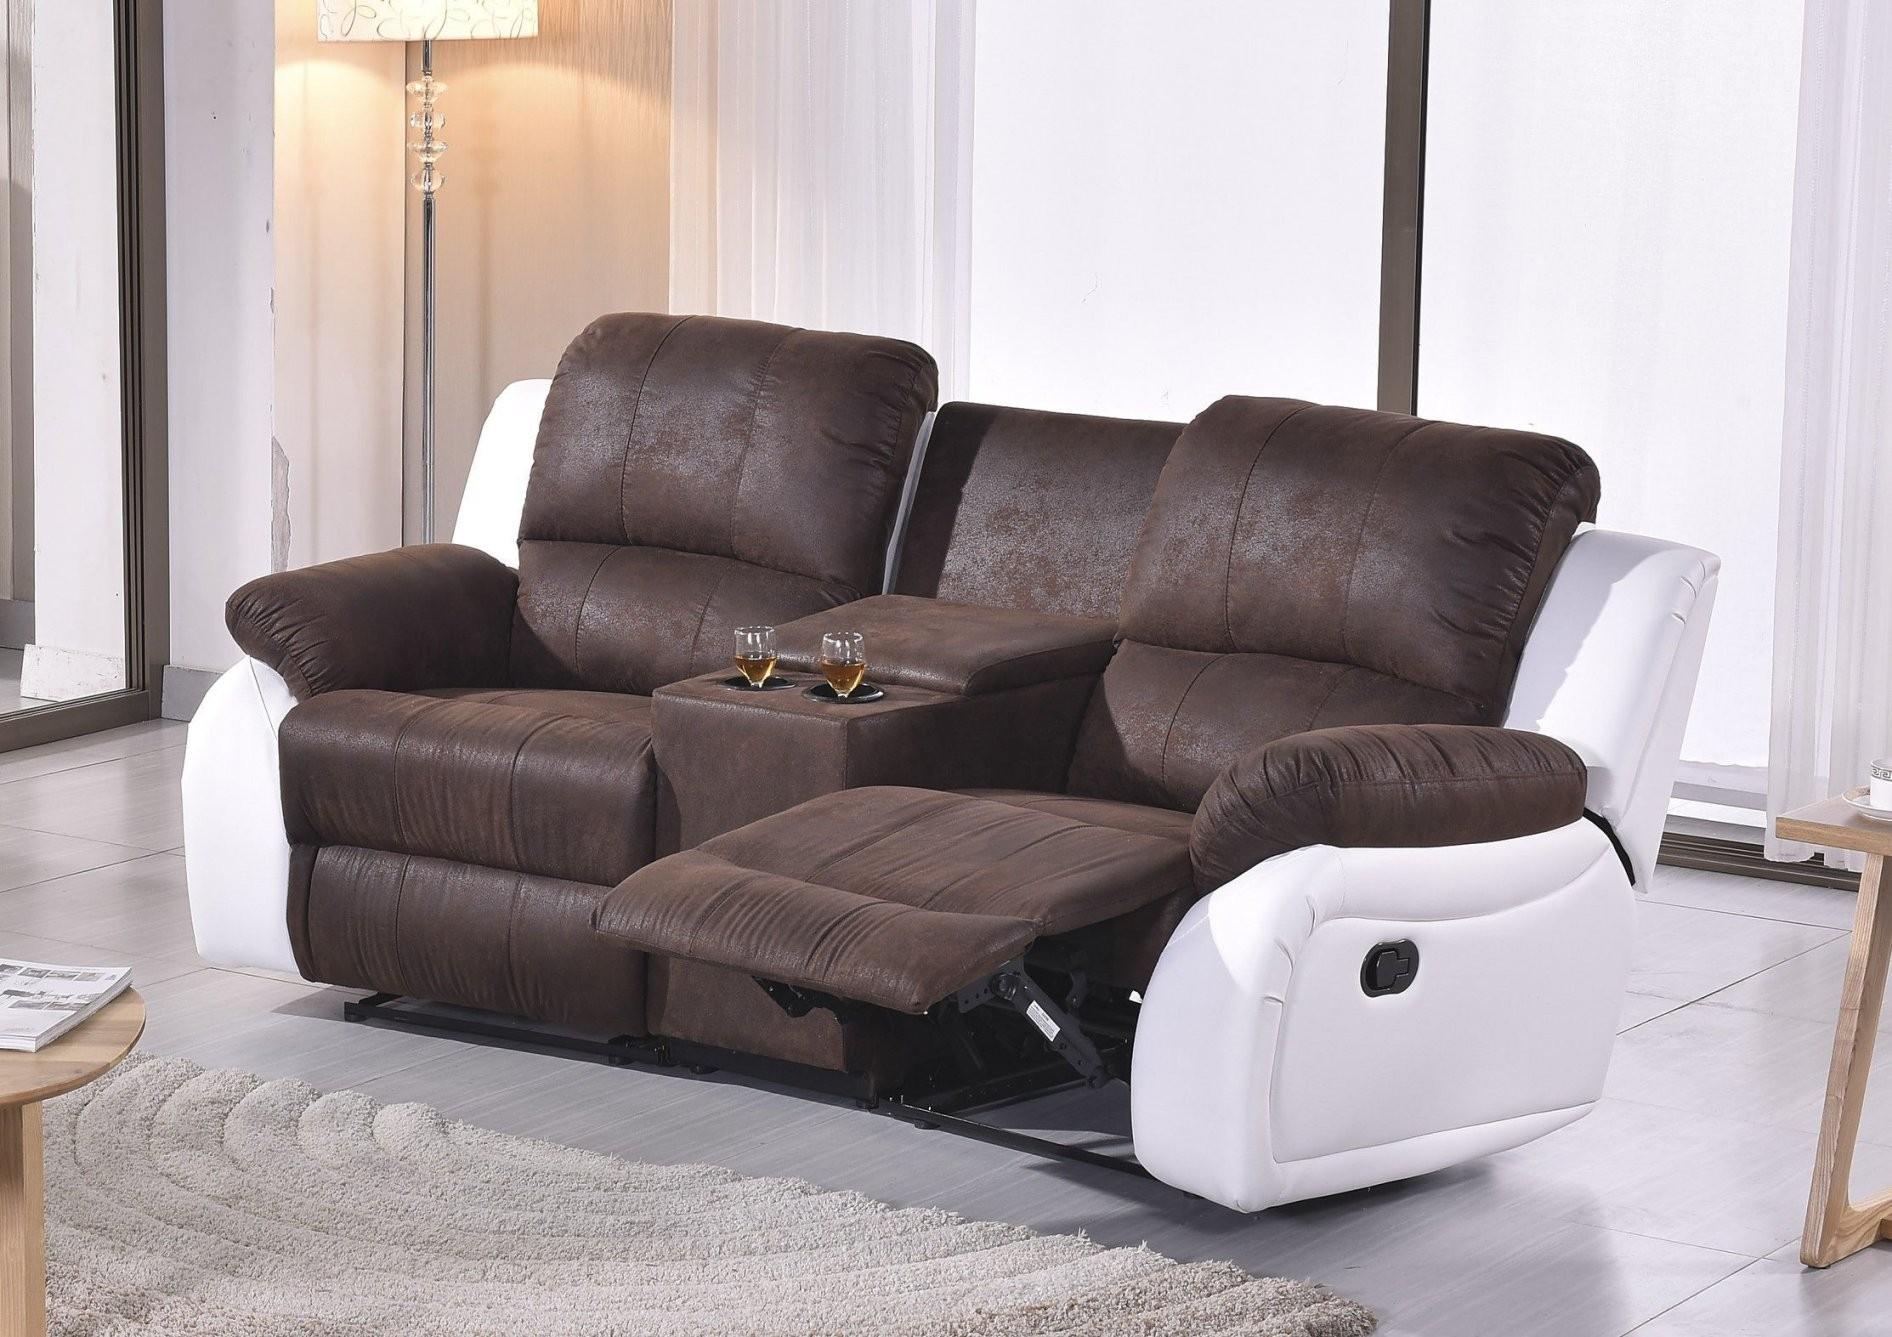 Braunweißes Mikrofaser Fernsehsofa Kinosofa Sofort  Mapo Möbel von Kino Sofa 2 Sitzer Photo